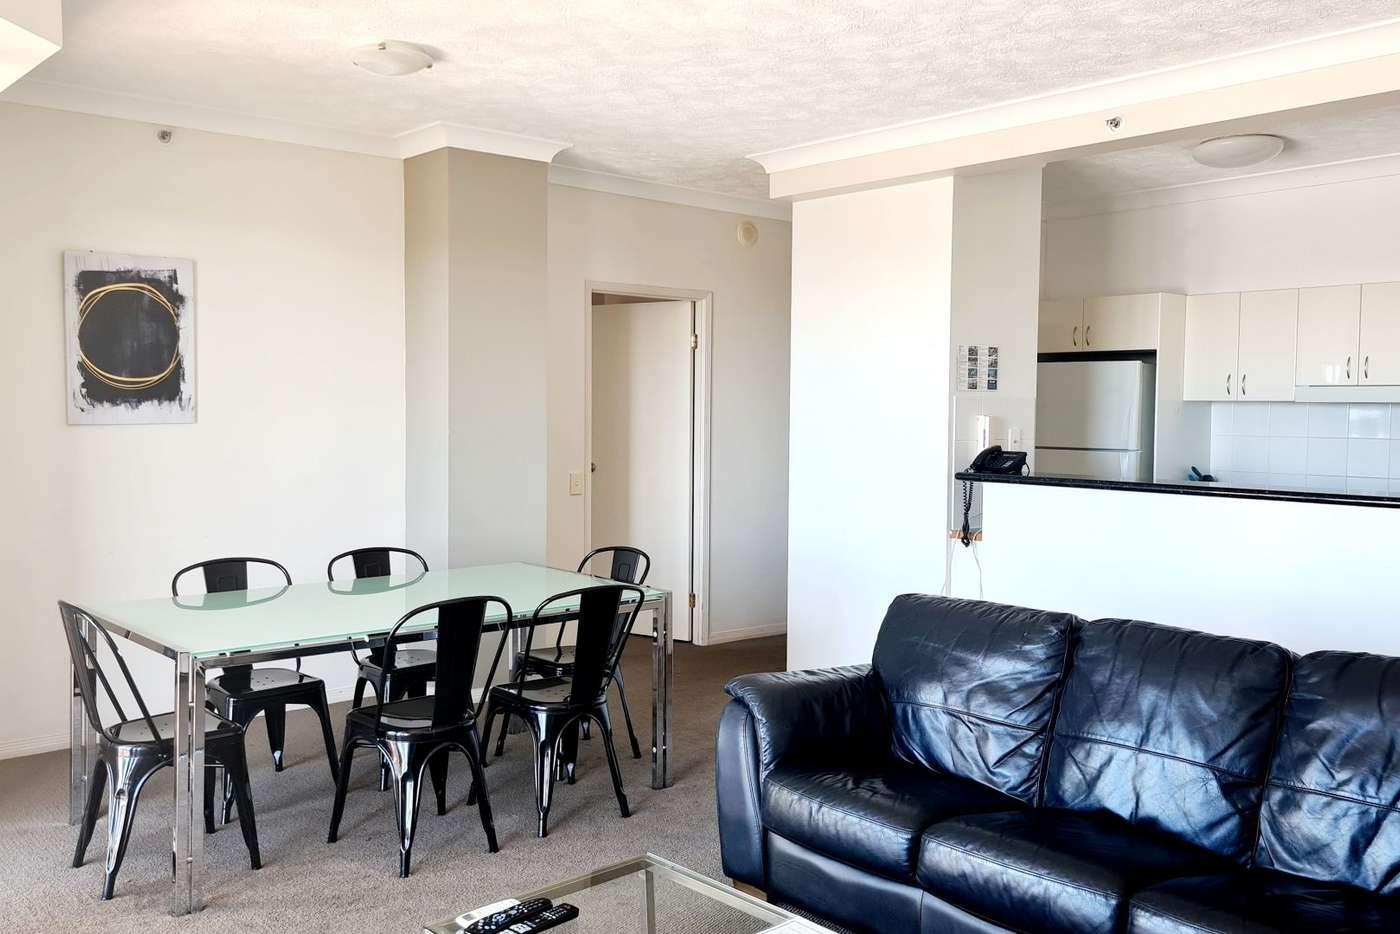 Main view of Homely apartment listing, ID:3918713/55 Baildon Street, Kangaroo Point QLD 4169